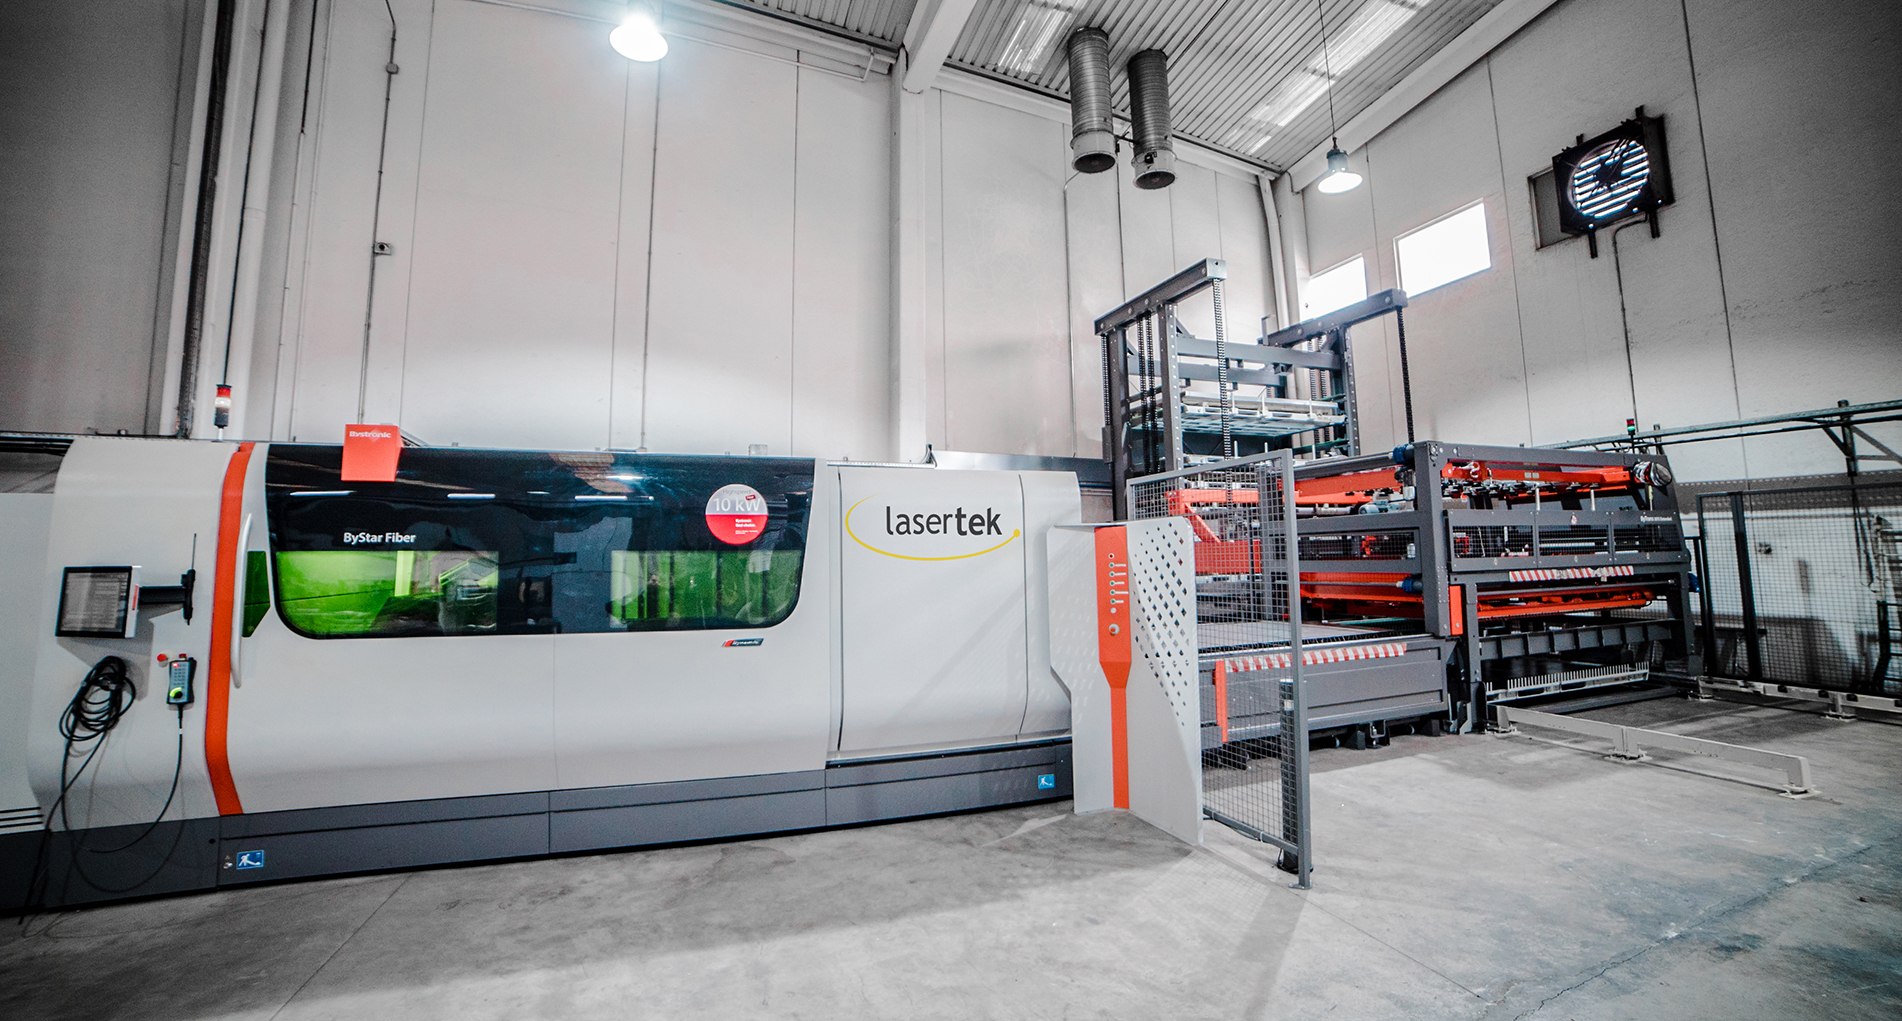 corte laser con Bystronic en LASERTEK 2